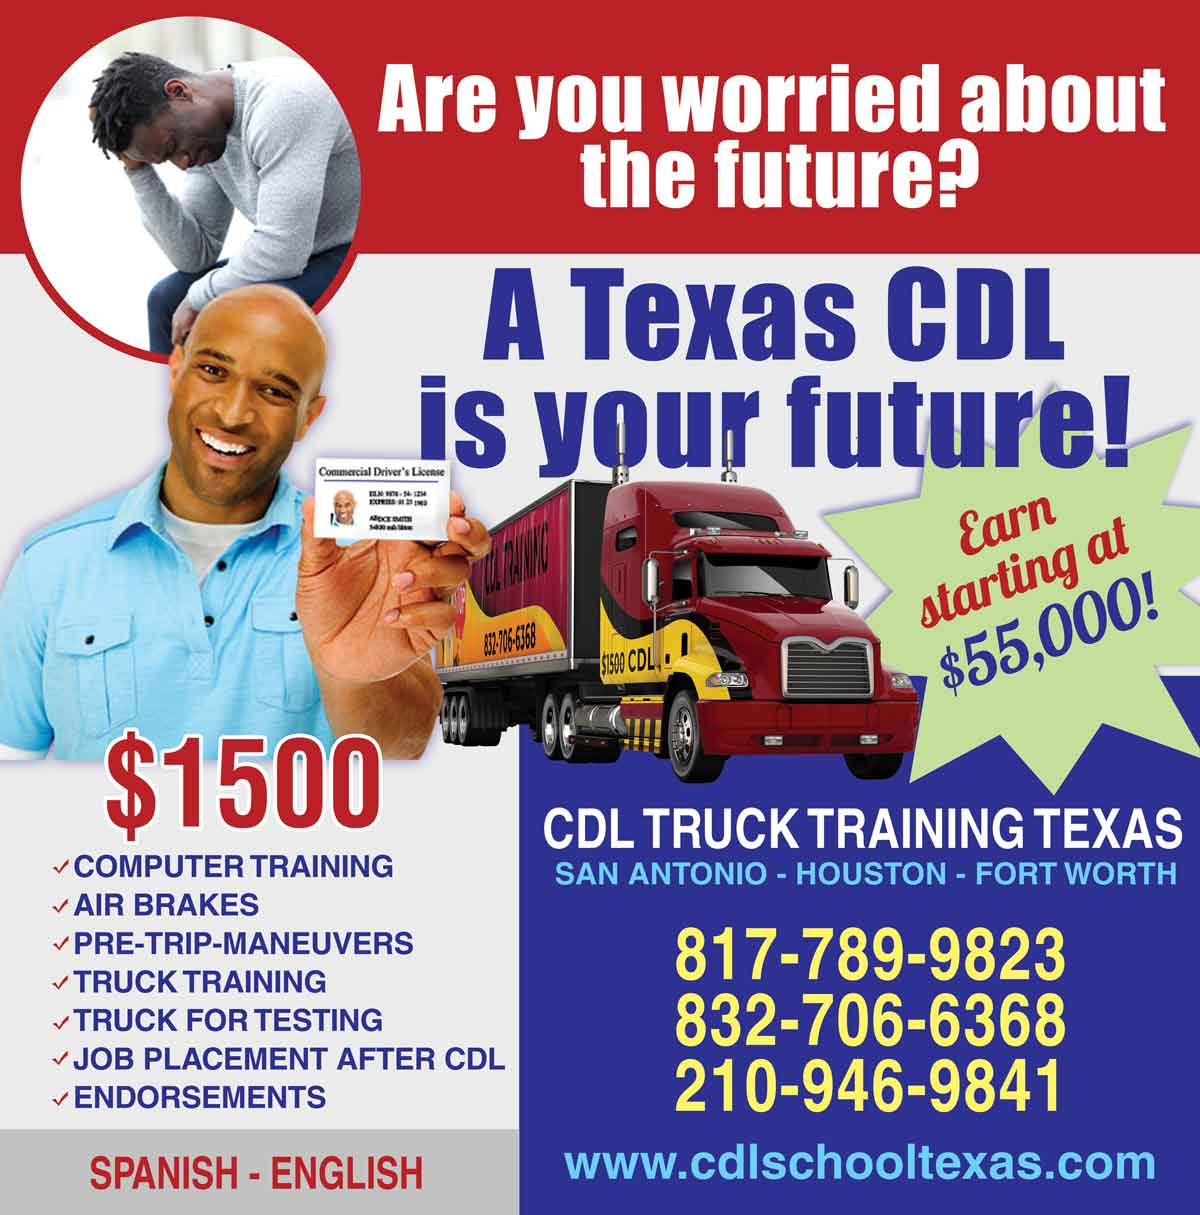 Mcallen truck driving Details